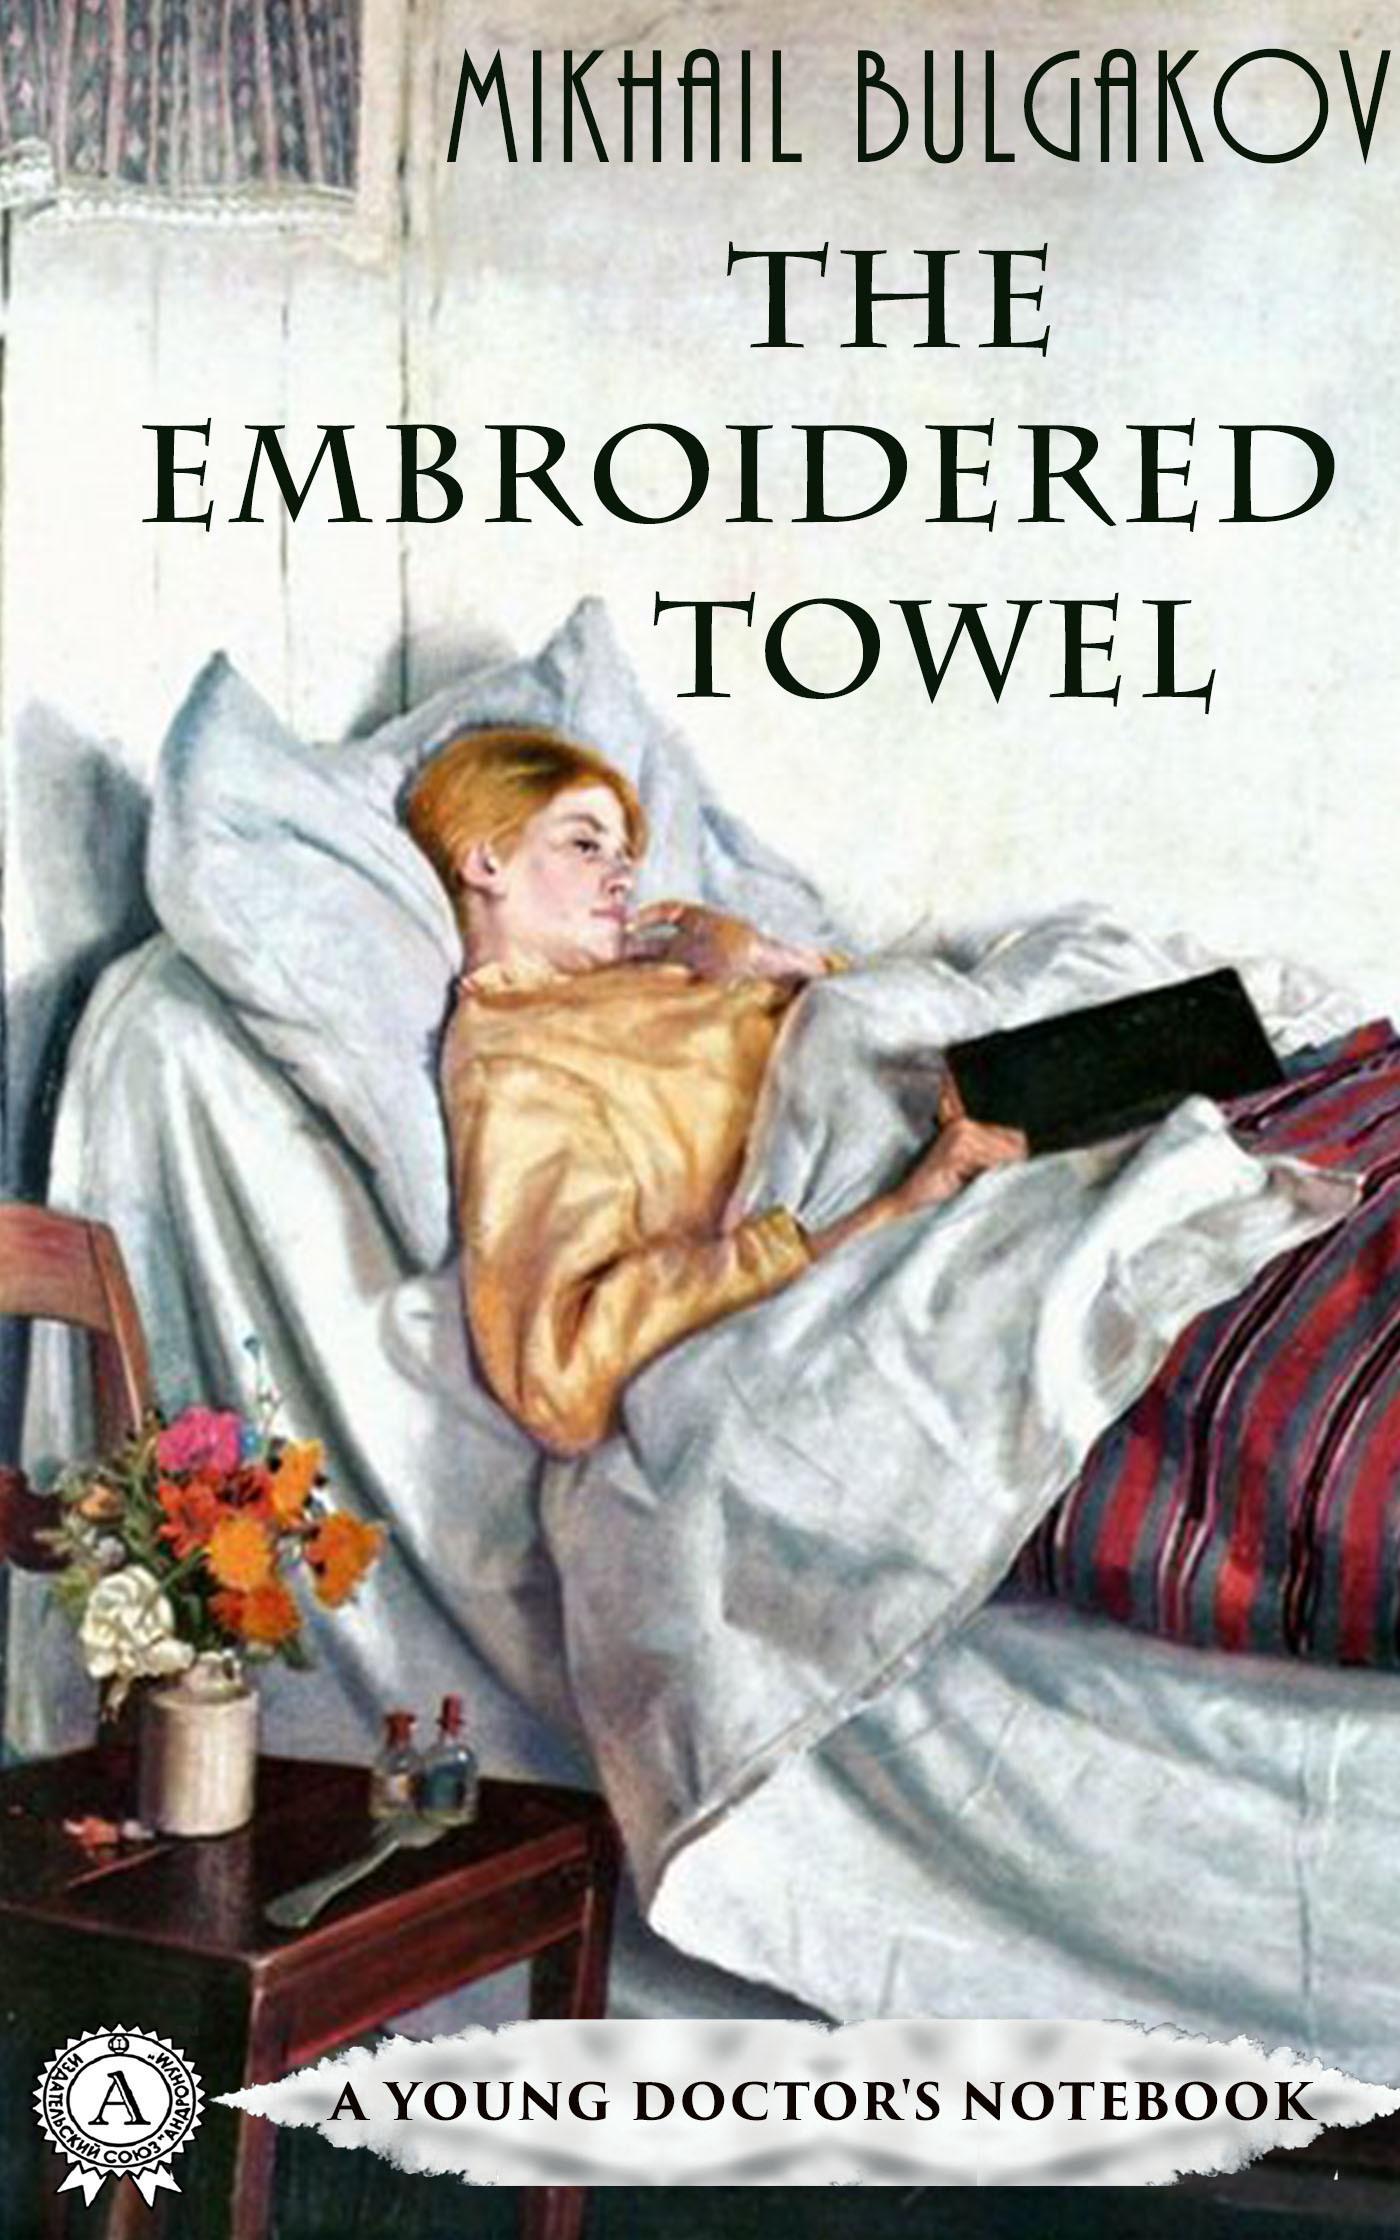 цена на Михаил Булгаков The Embroidered Towel